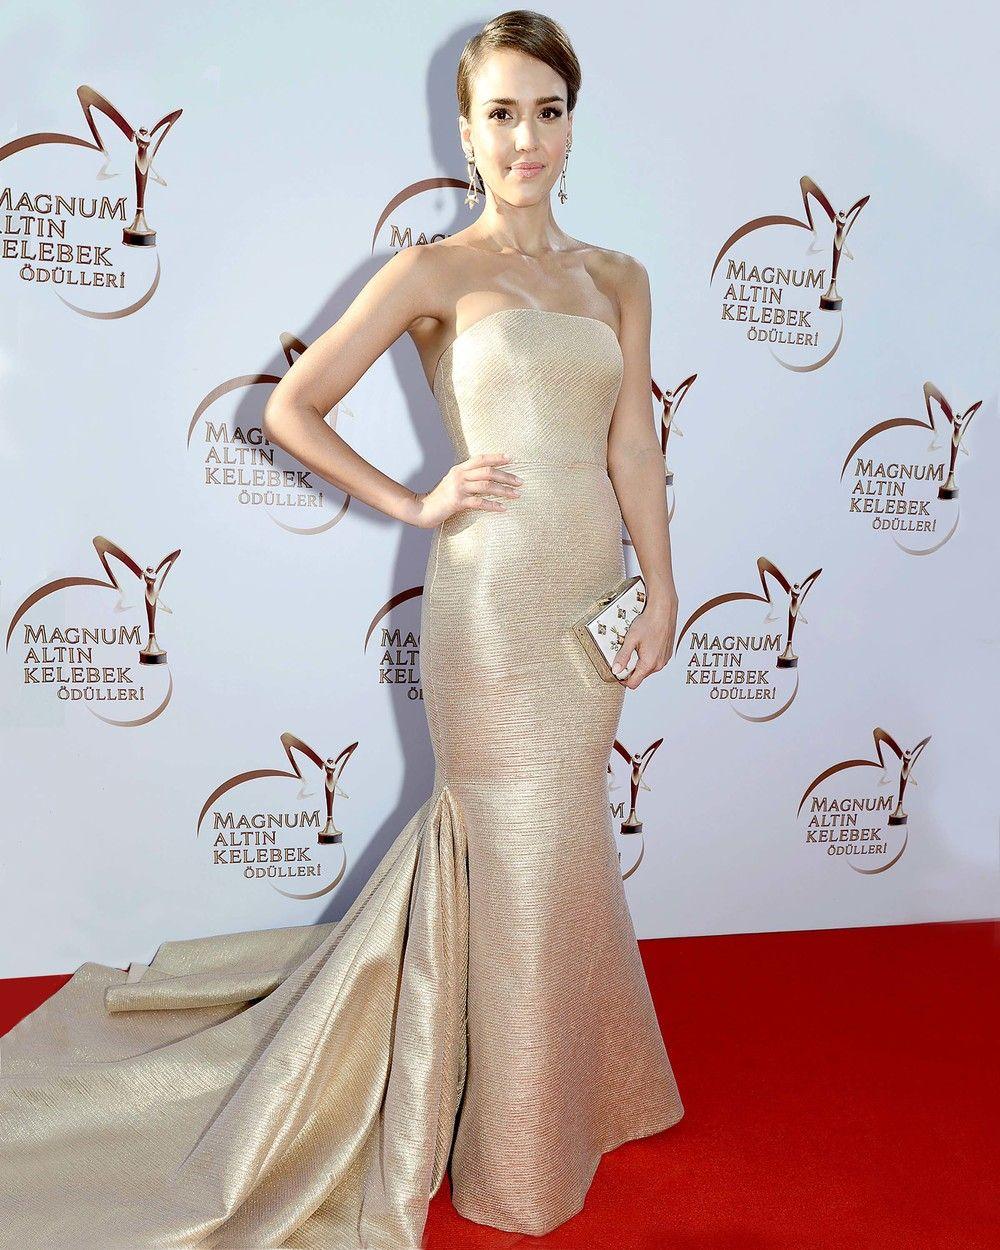 Jessica alba in my client romona kevezaus stunning metallic dress